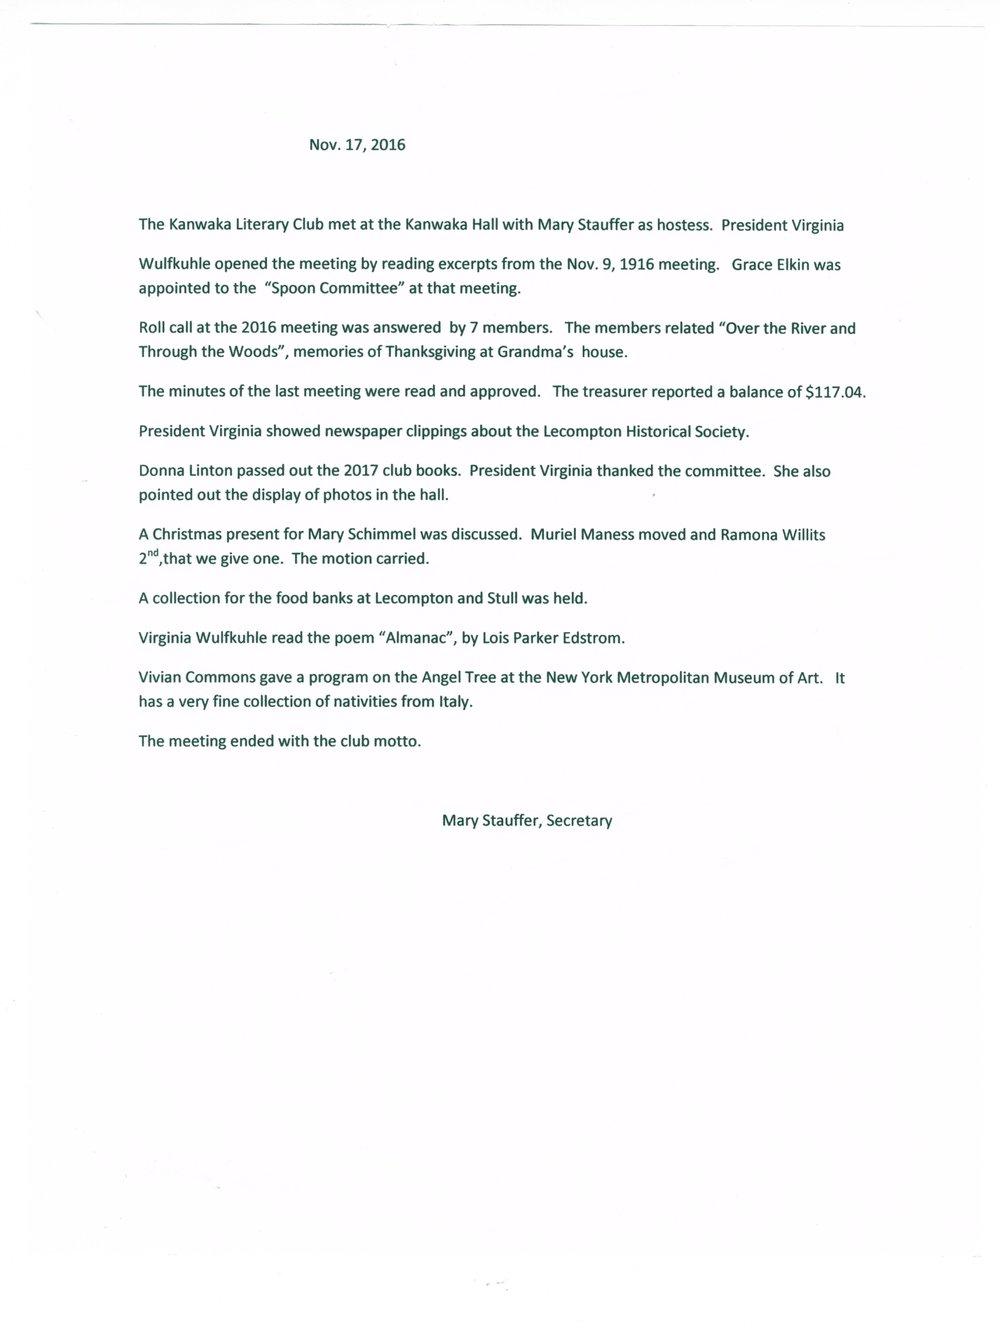 Kanwaka Literary Club records - Nov 17, 20167